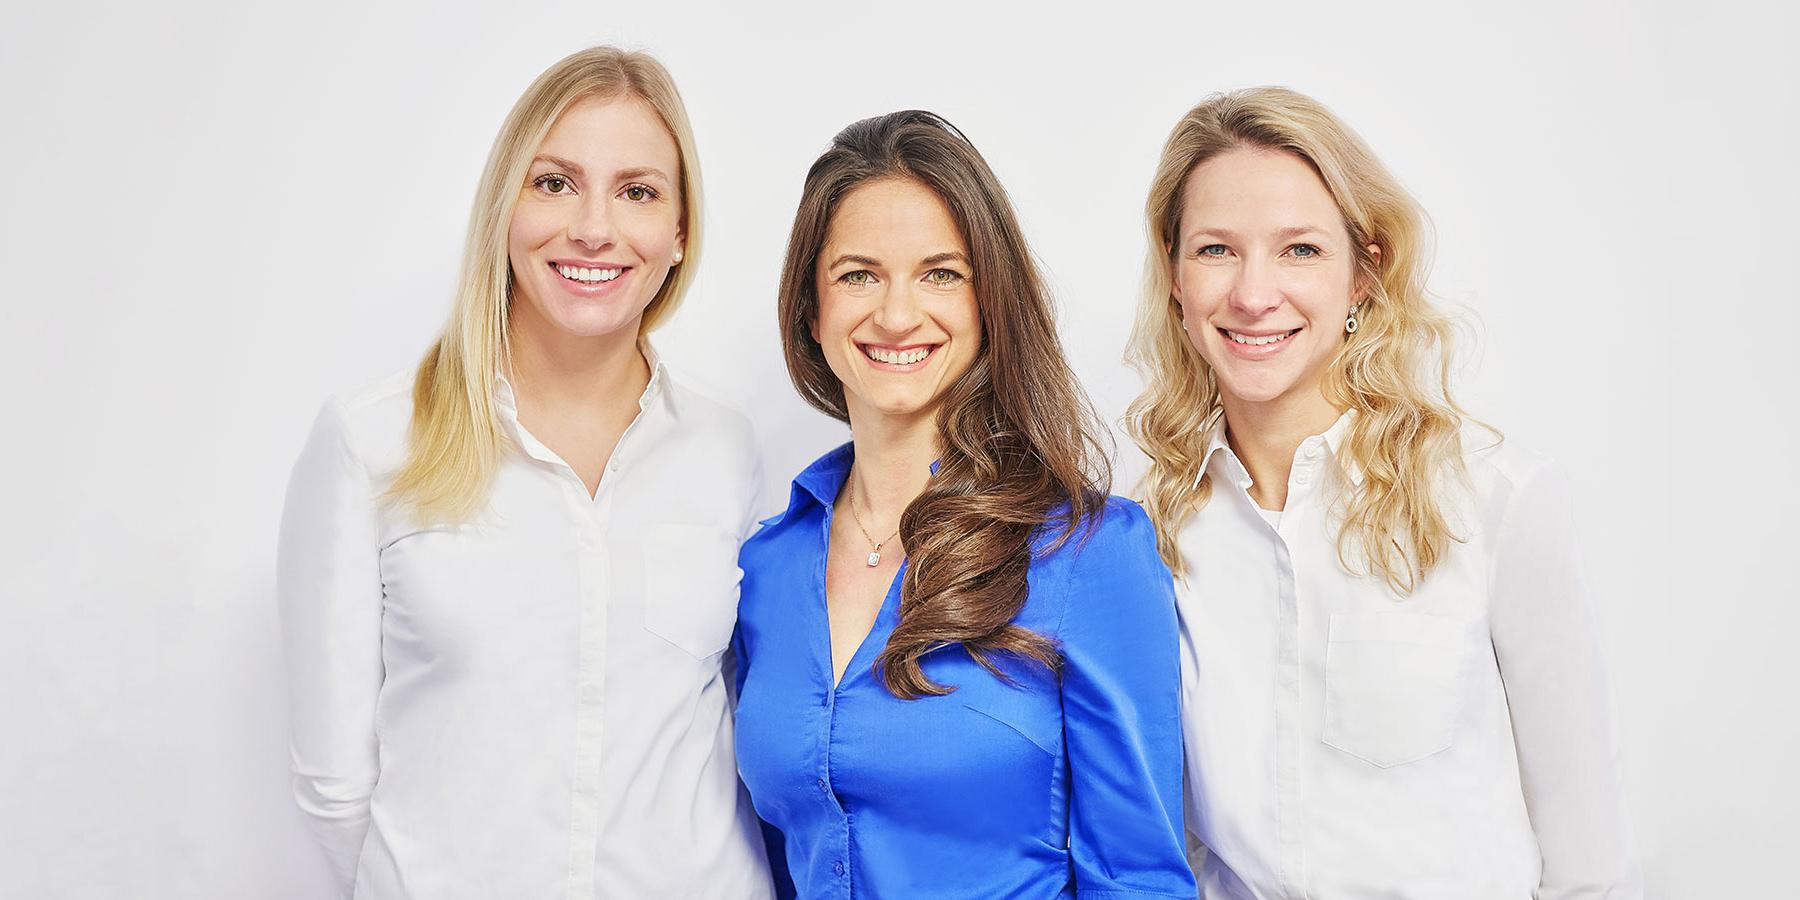 Fachzahnärztin für Kieferorthopädie - Kieferorthopäde Freising Smile - Team